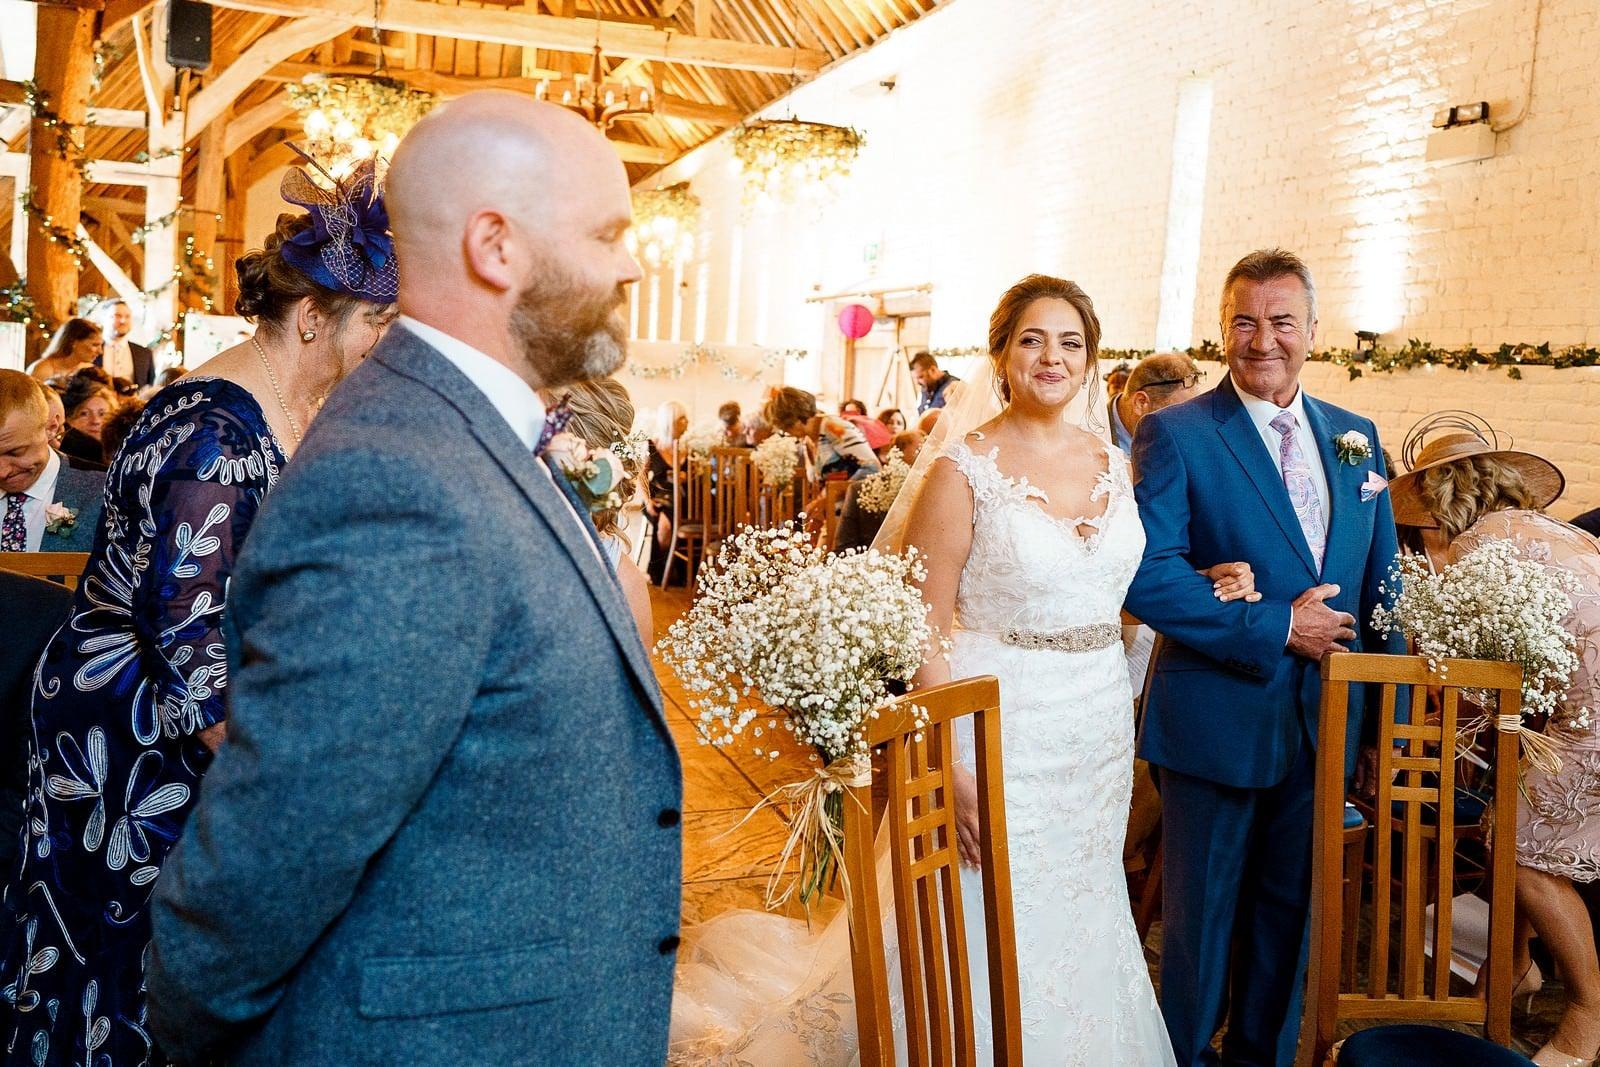 wedding ceremony at ufton court 1